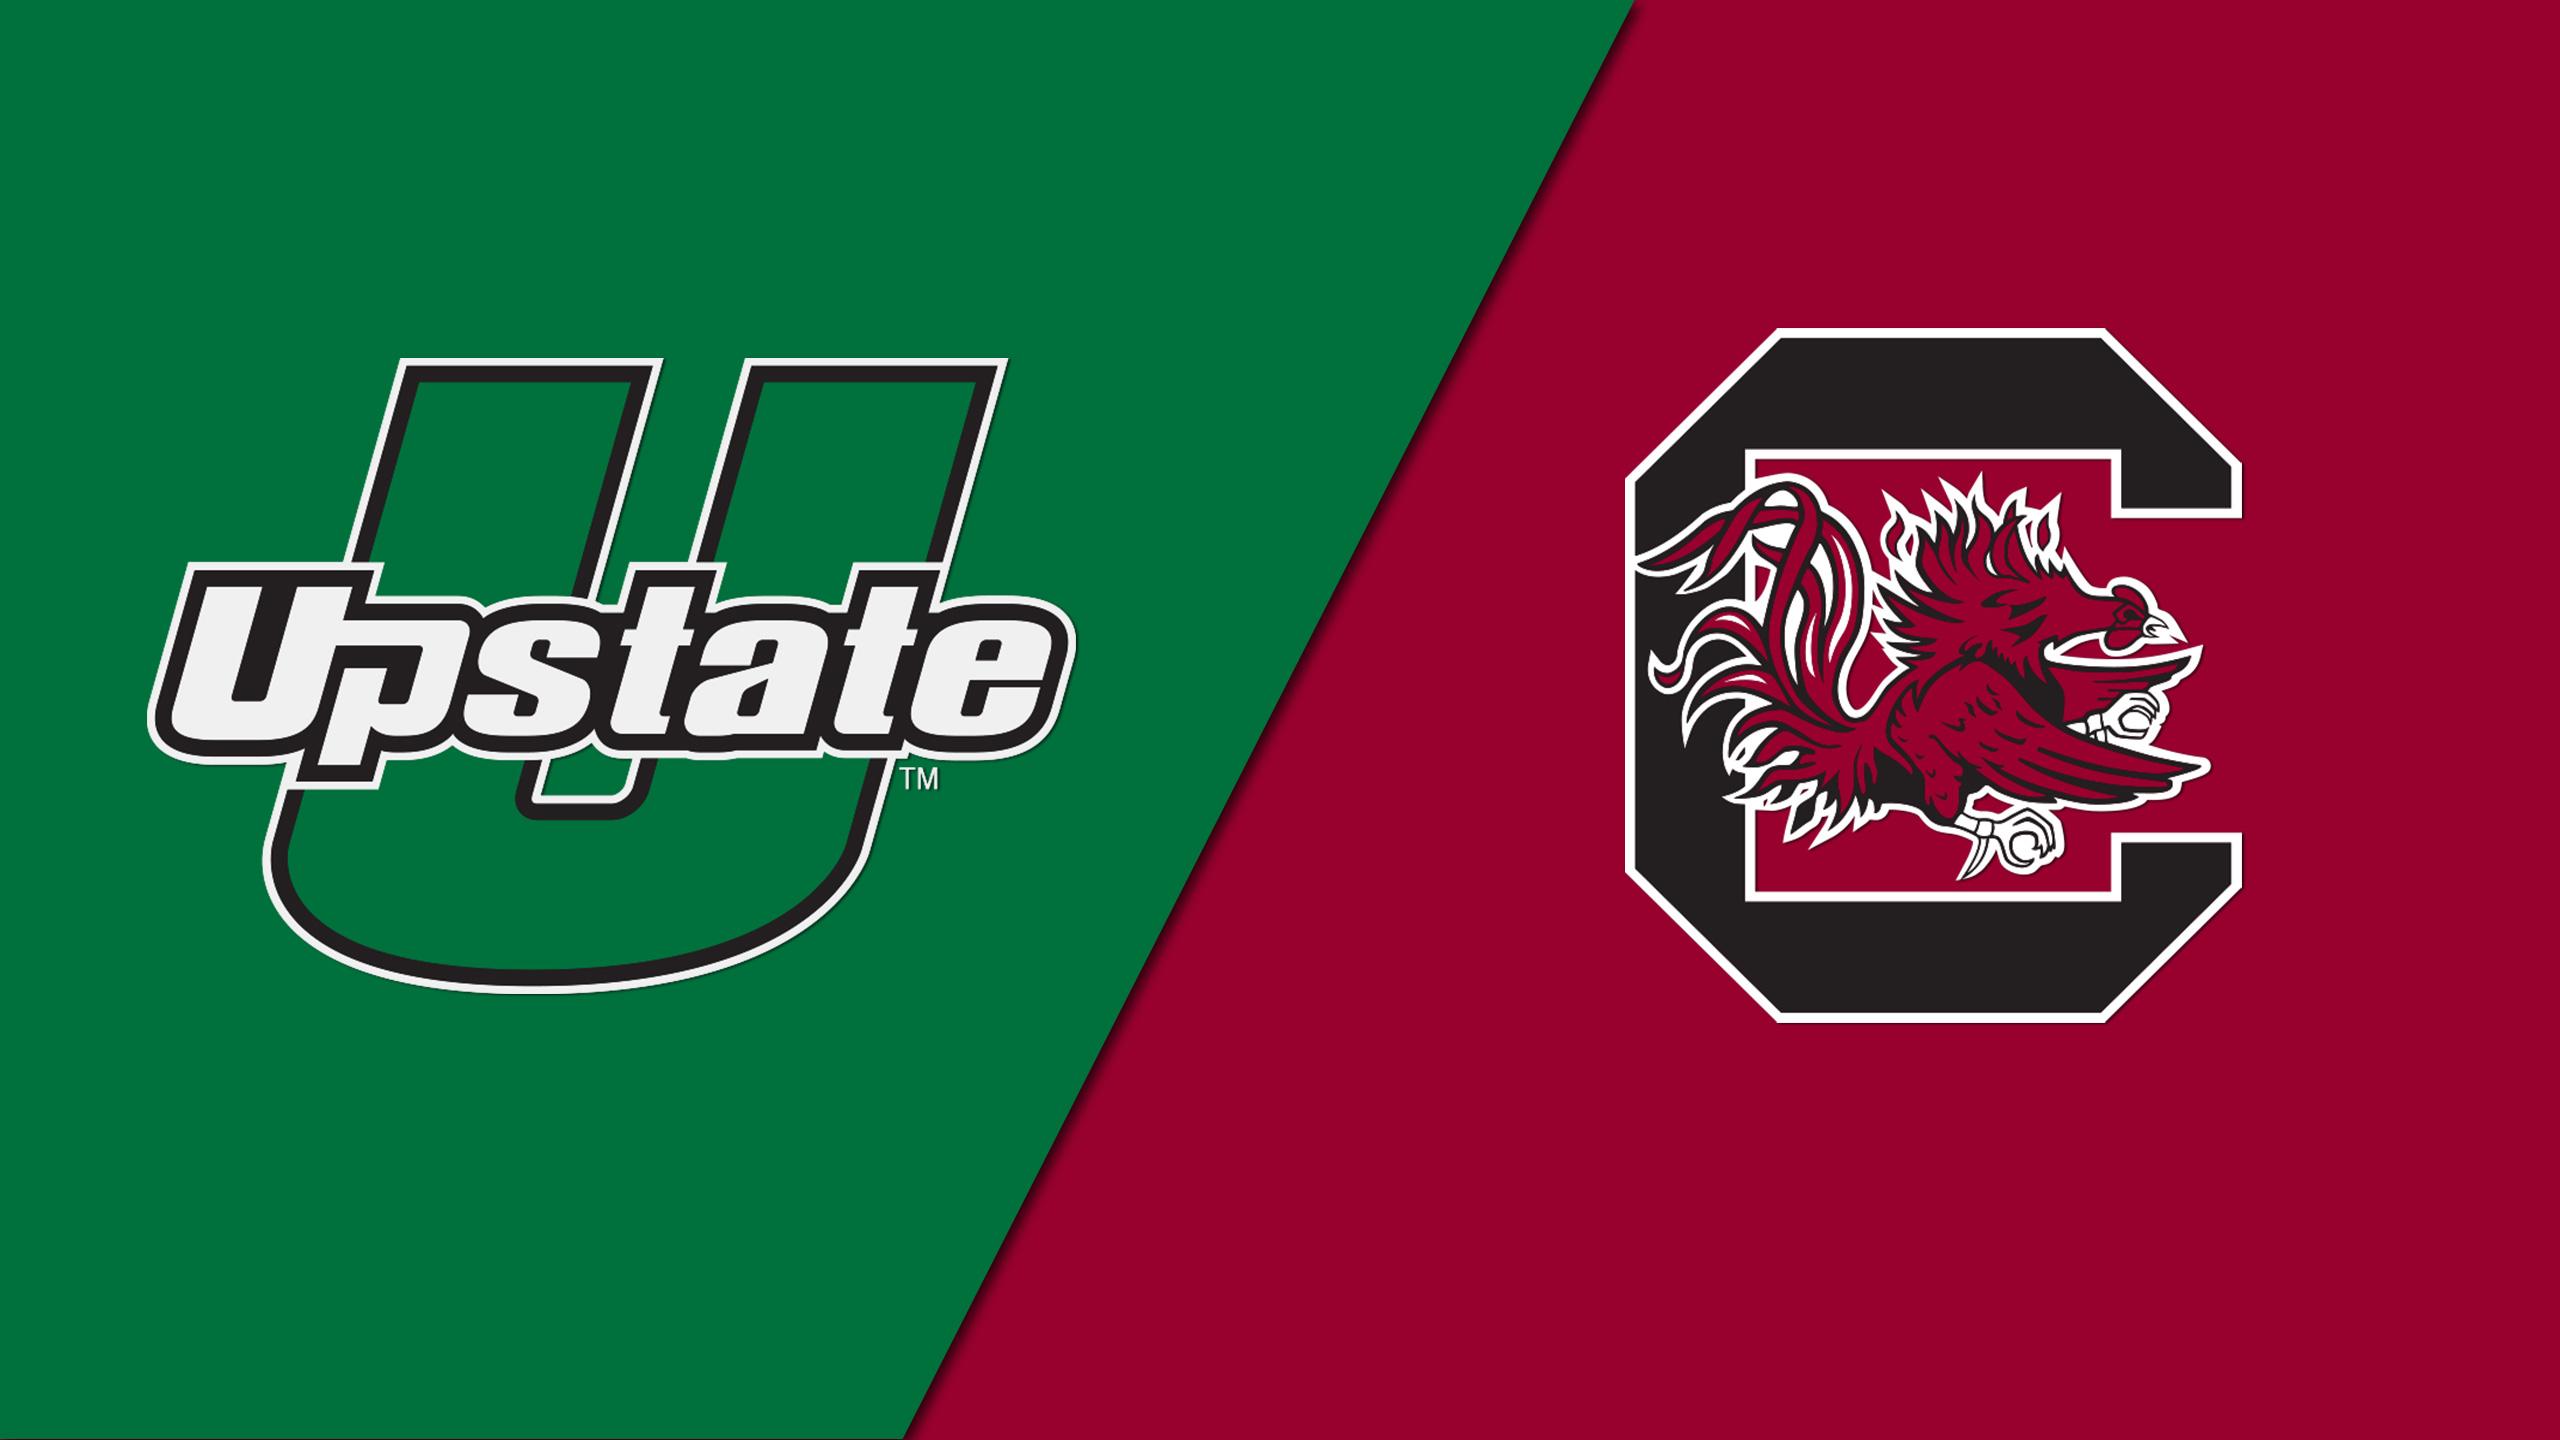 USC Upstate vs. South Carolina